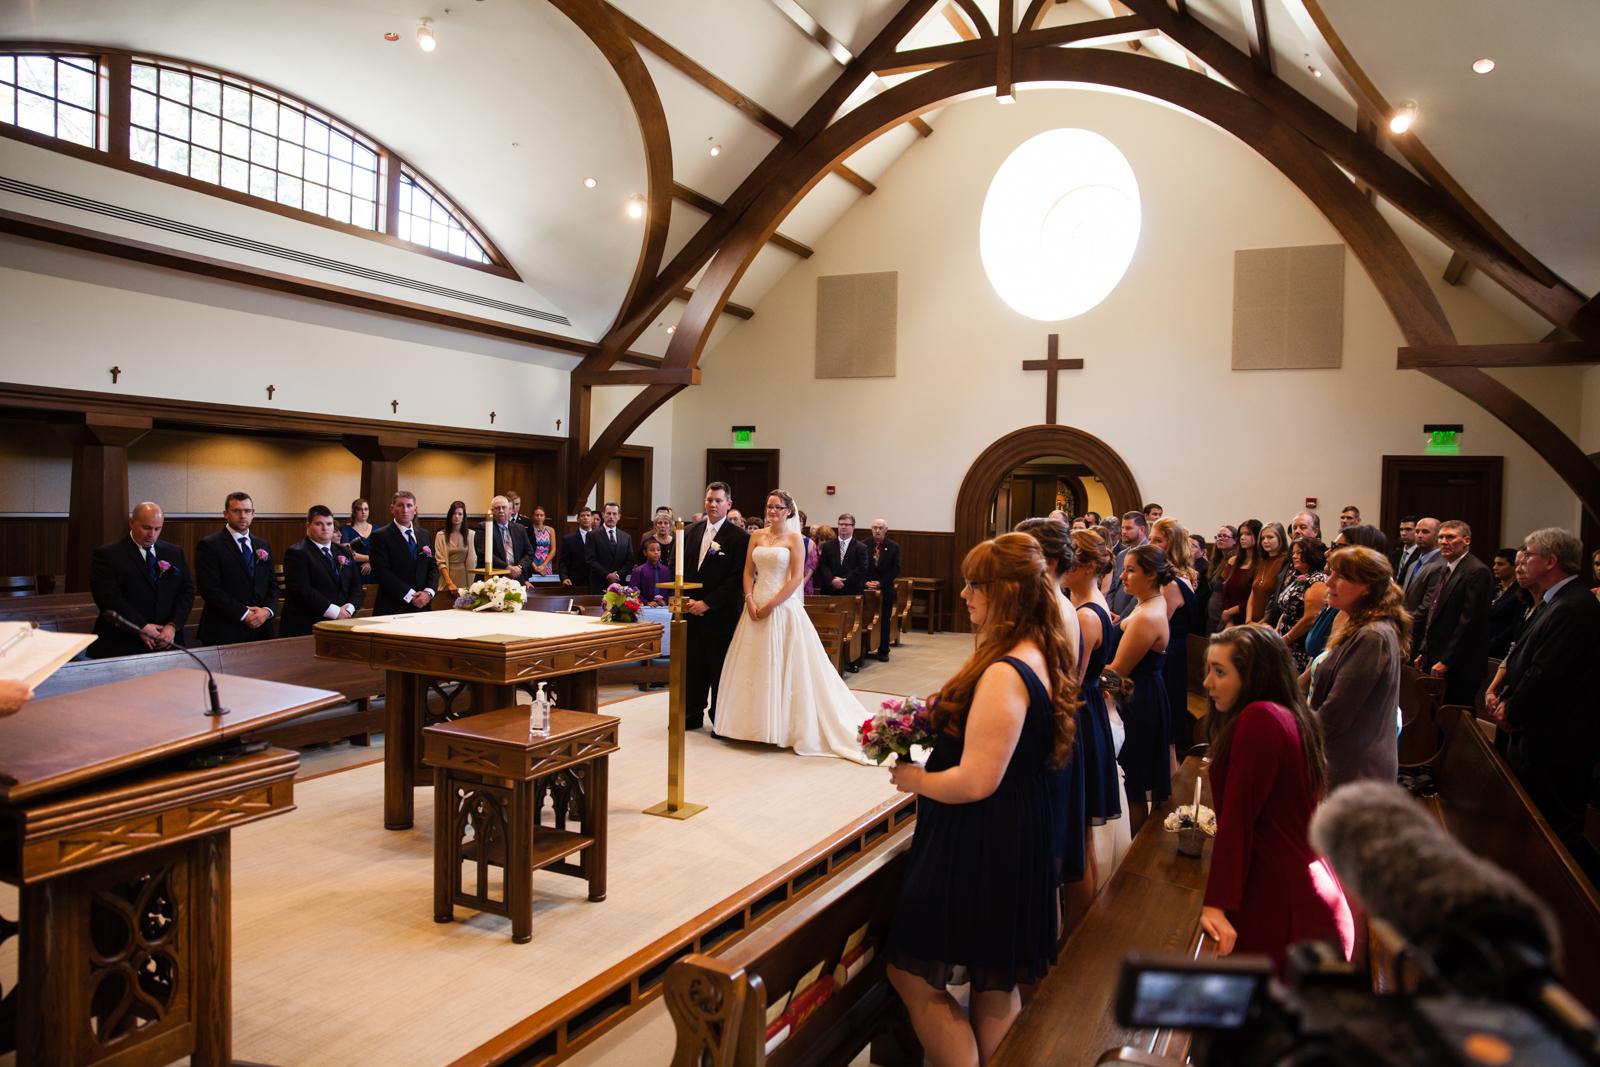 Eastons-Beach-Rotunda-Ballroom-Wedding-Newport-Rhode-Island-PhotographybyAmandaMorgan-33.jpg